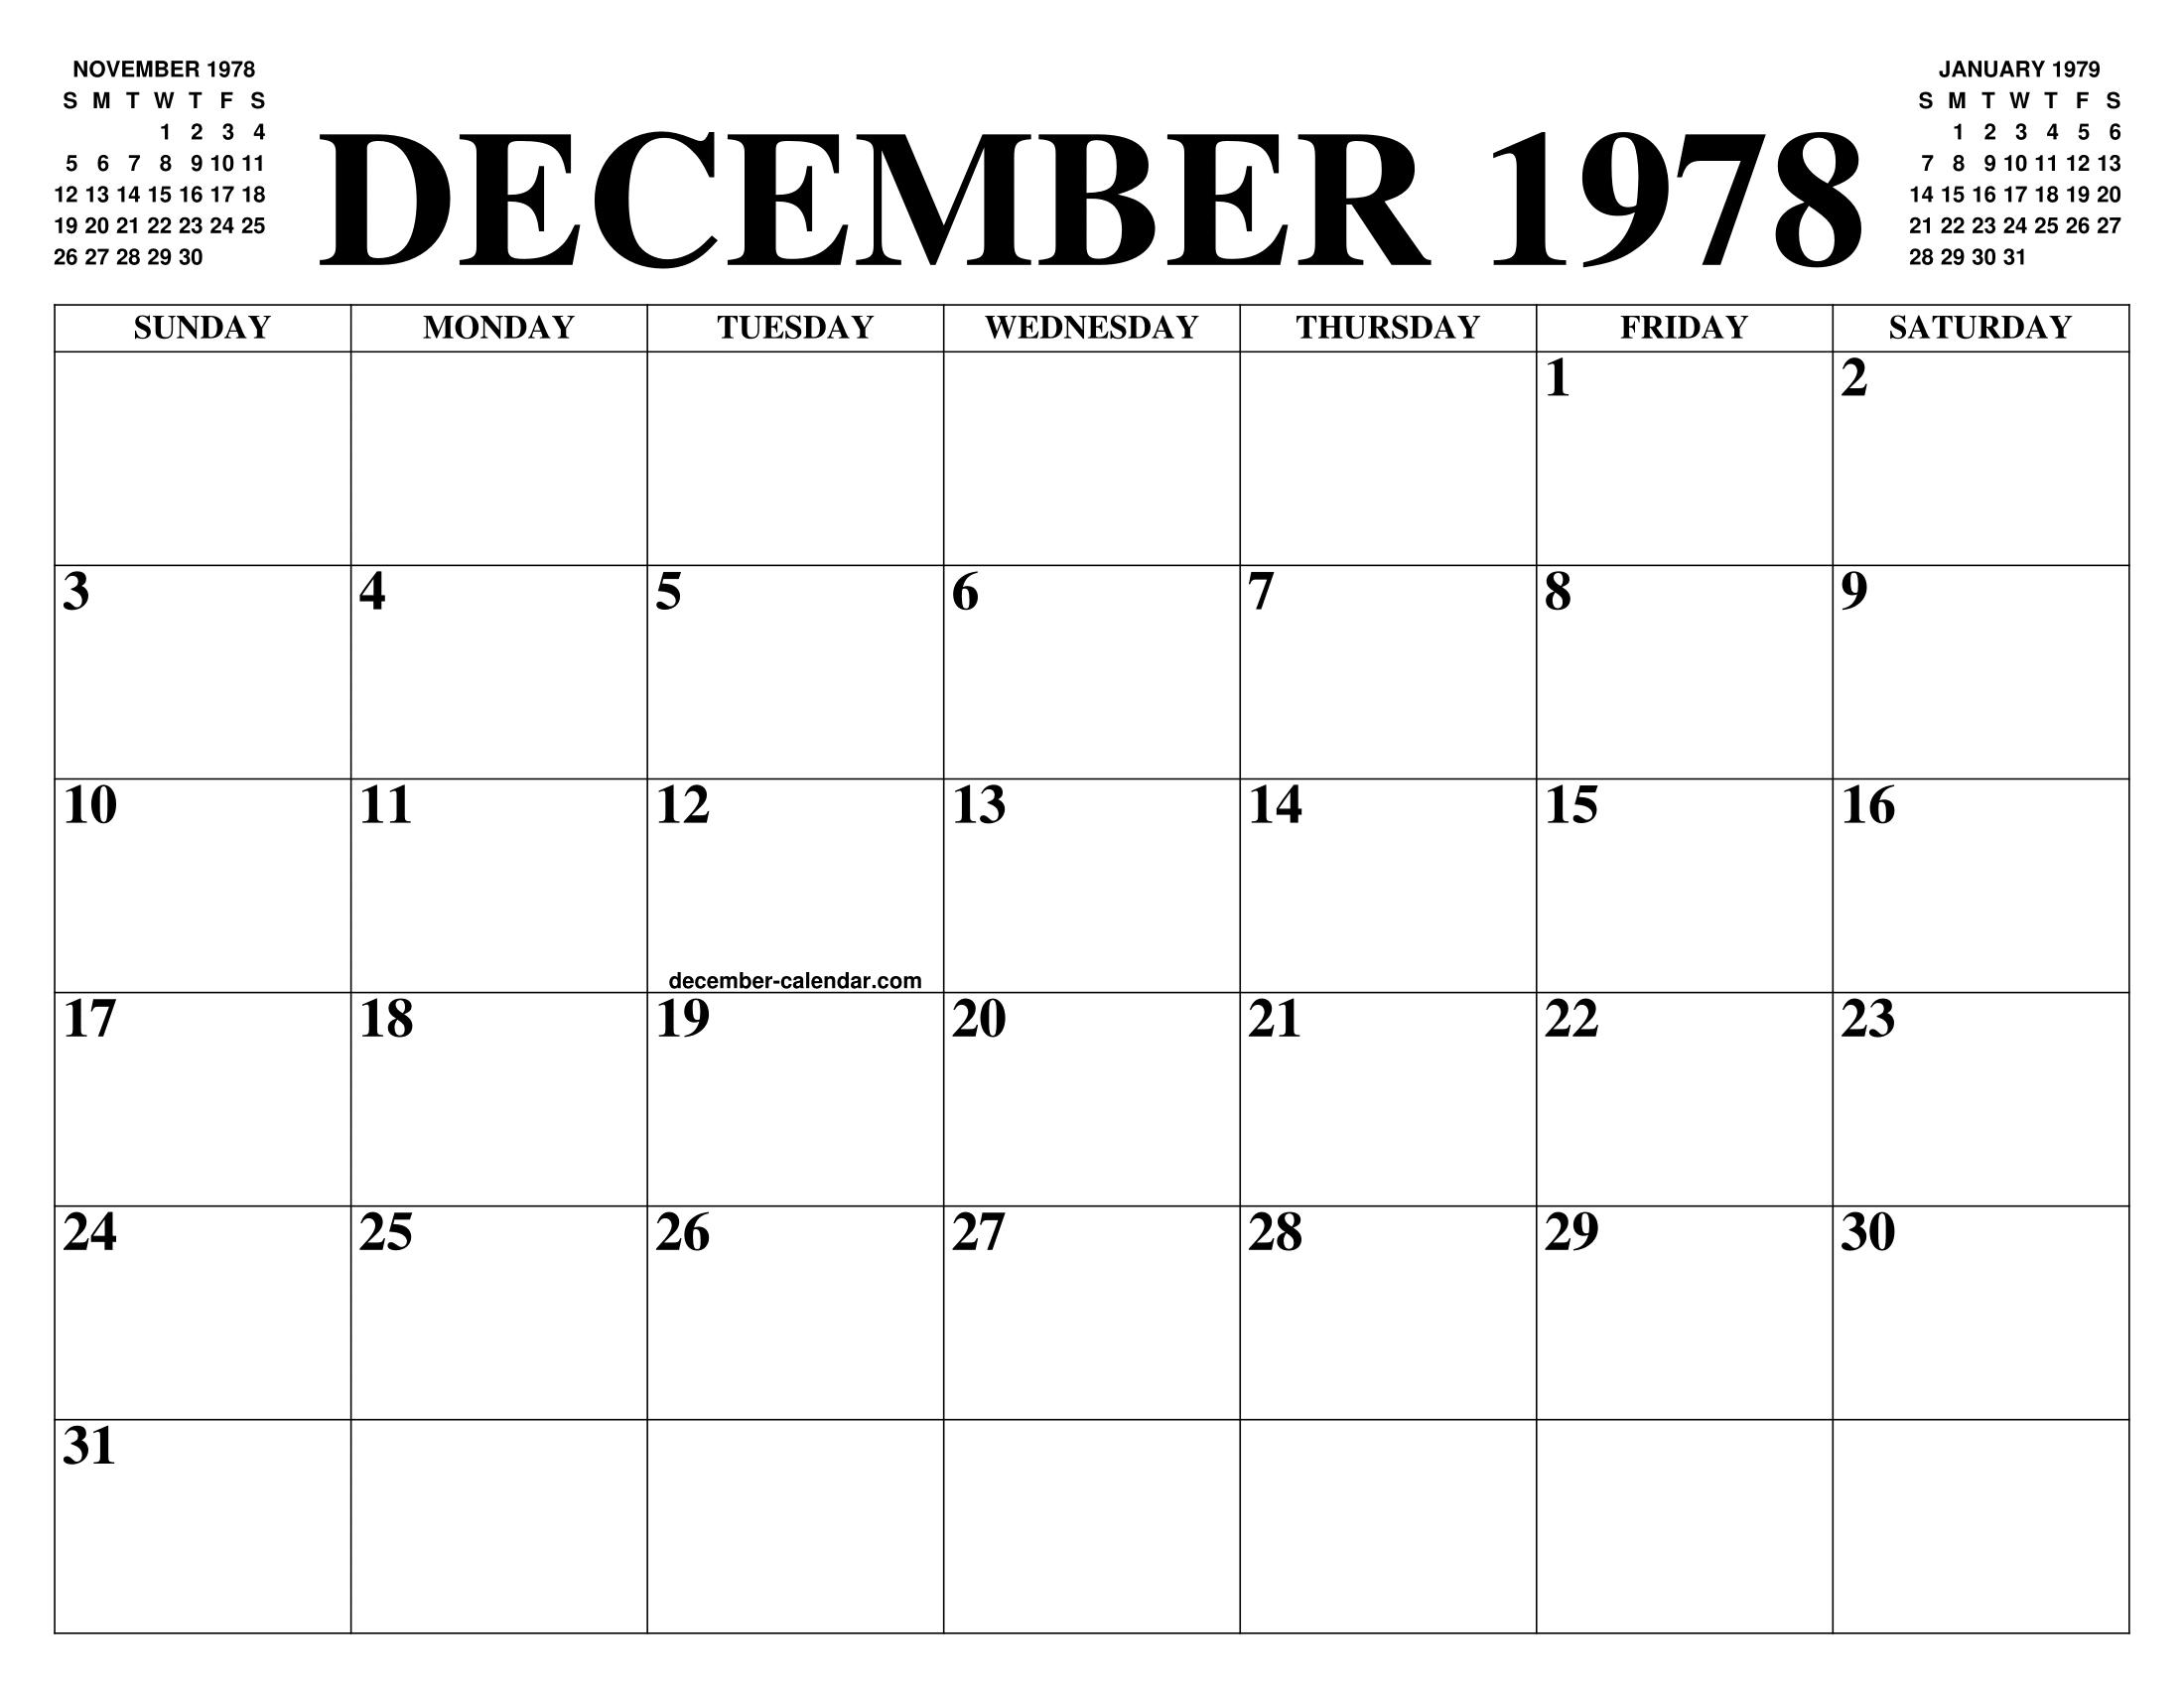 Calendario 1978.December 1978 Calendar Of The Month Free Printable December